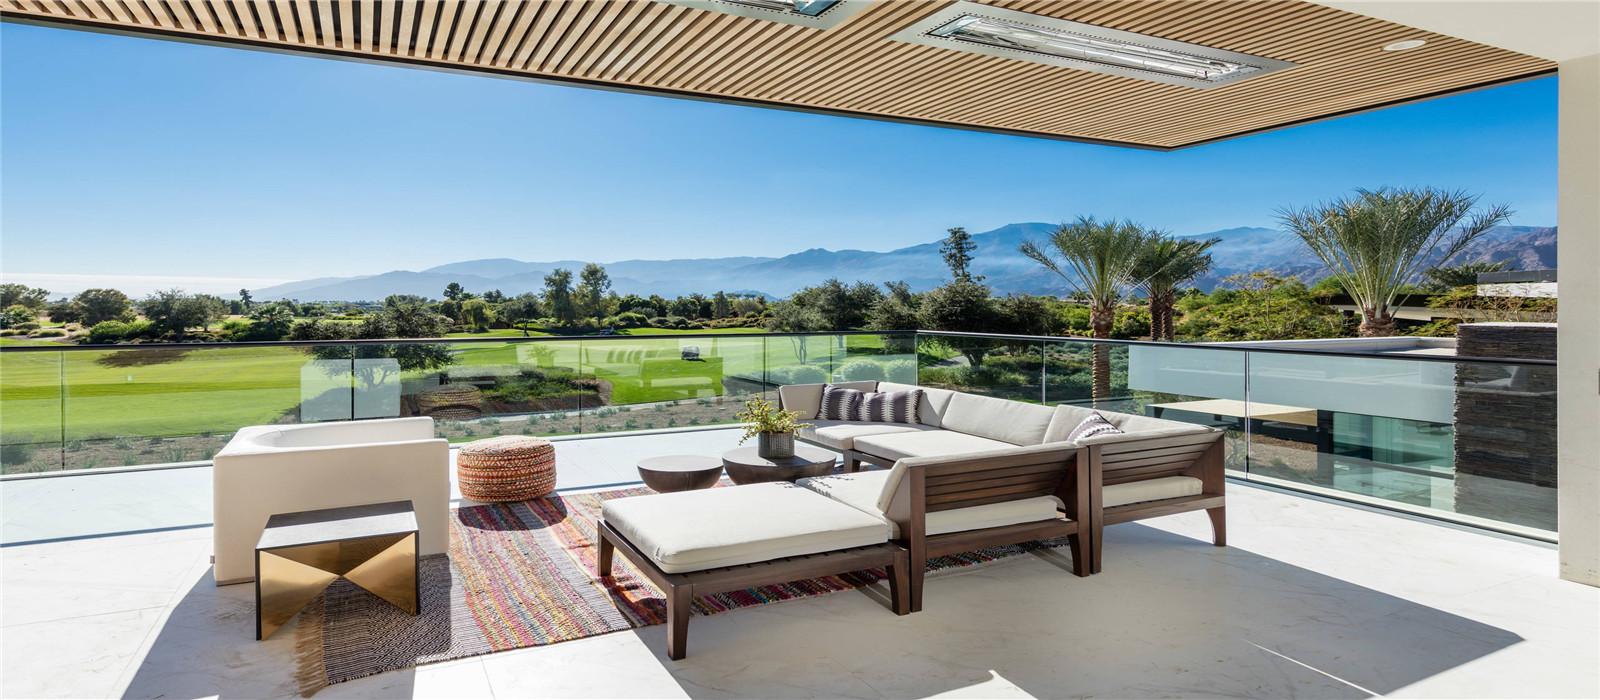 High end fremeless glass railing from Housing Industry Co.,Ltd